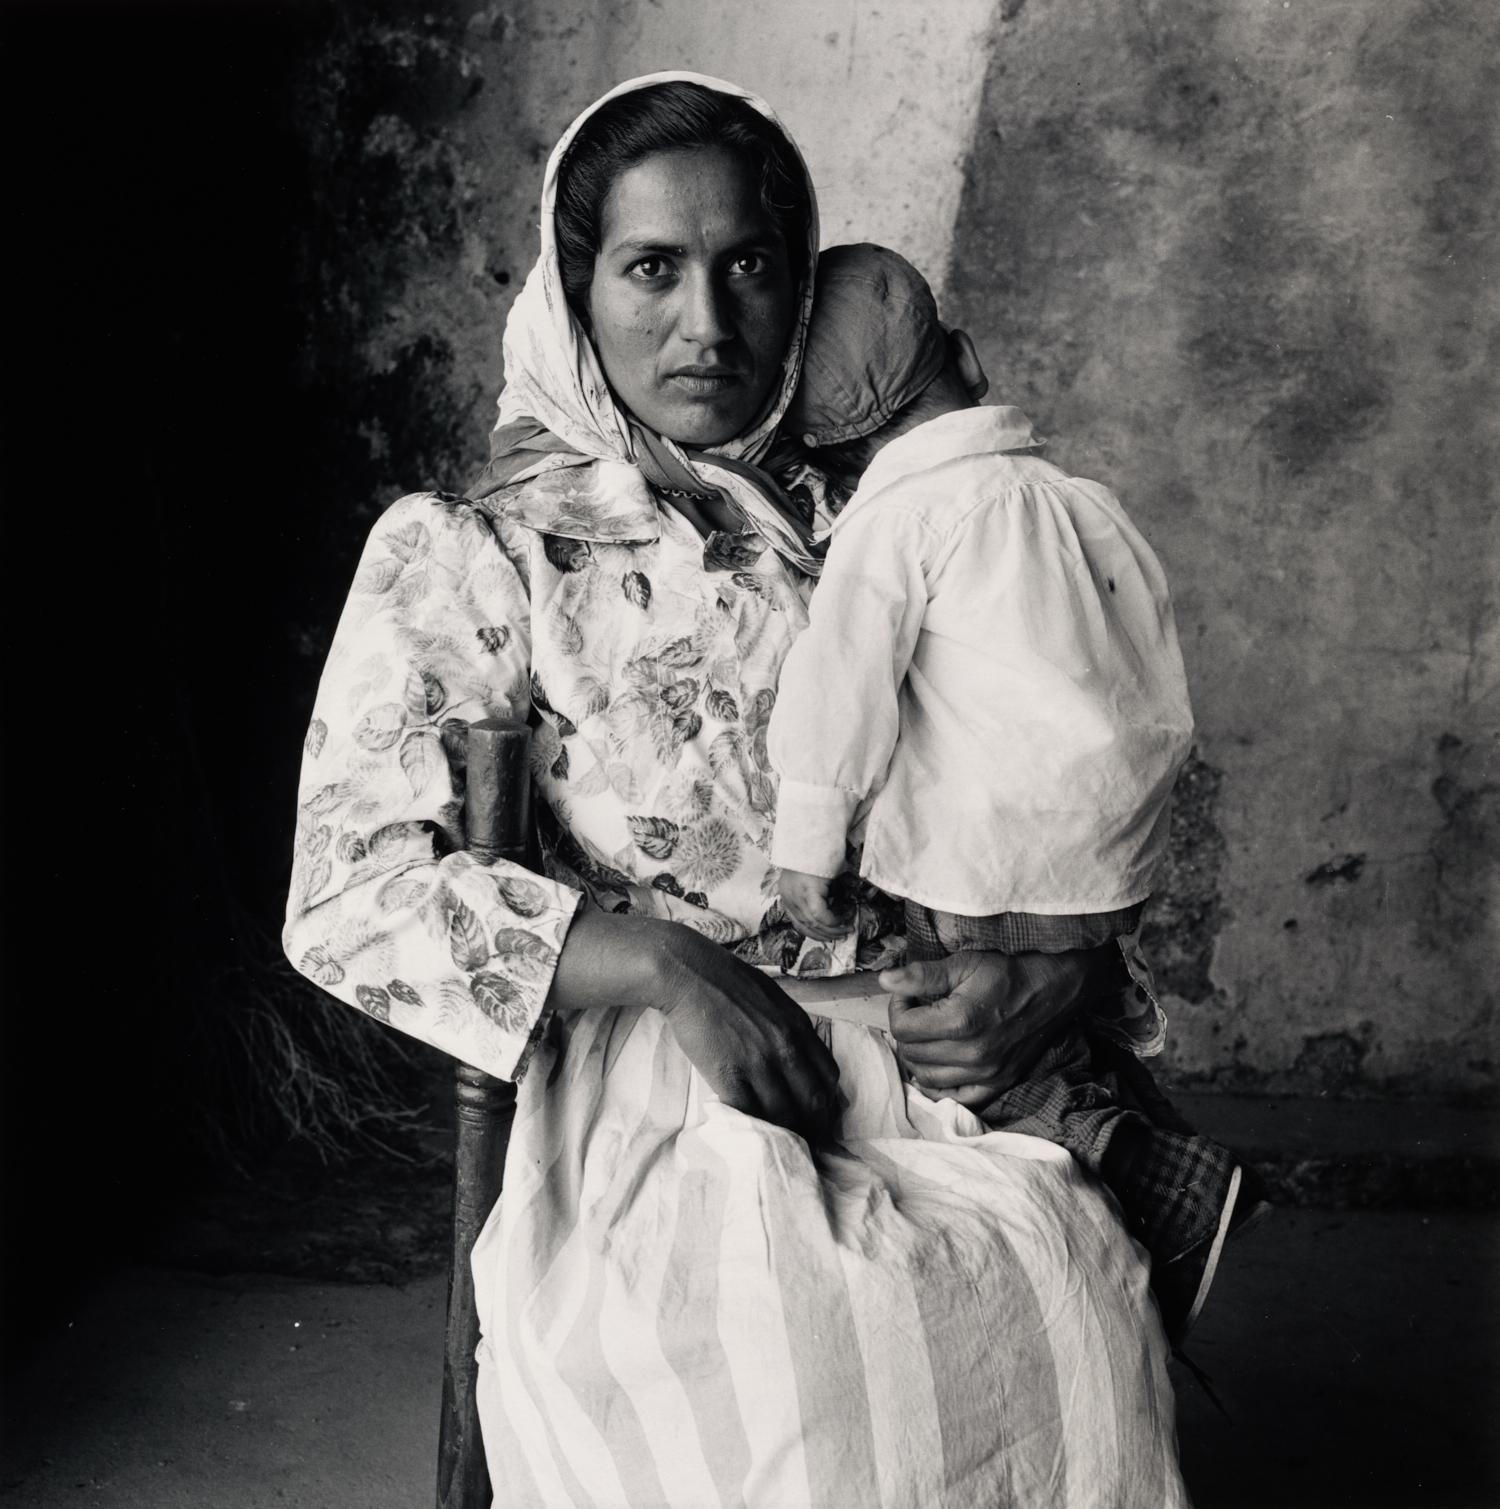 Gypsy Mother Holding Sleeping Child , Extremadura, Spain, 1965 Gelatin silver print © The Irving Penn Foundation